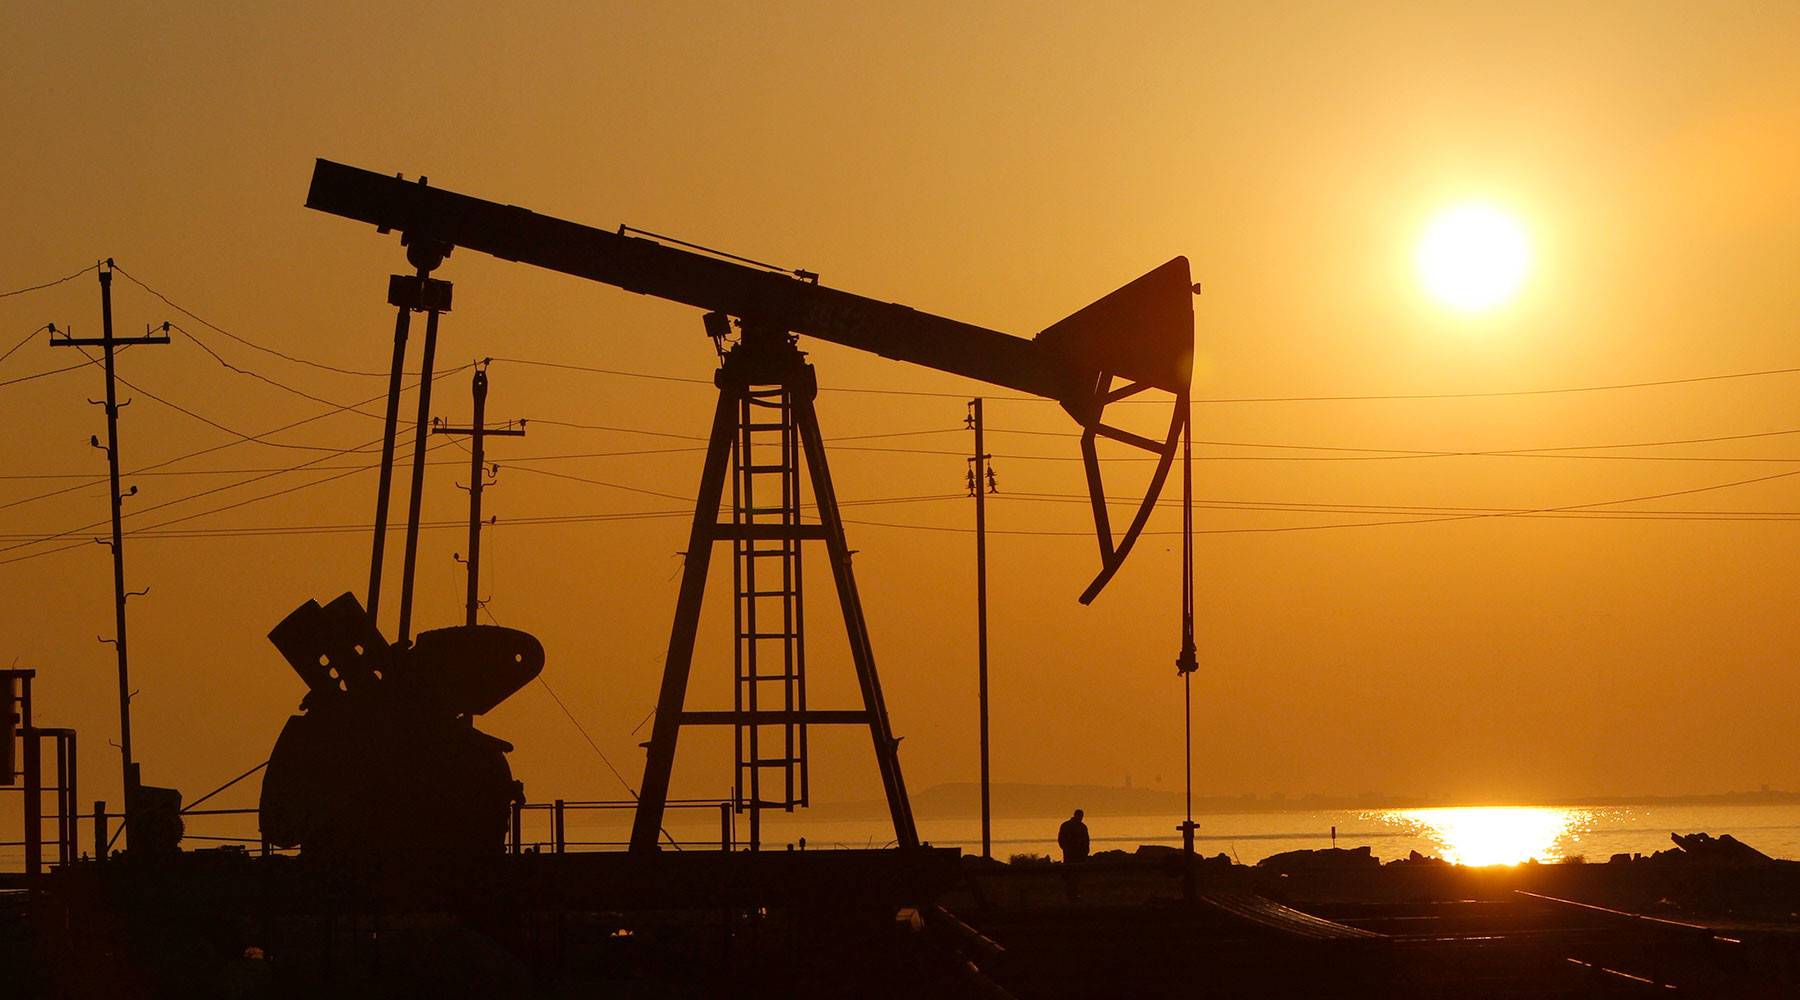 глава ОПЕК о ситуации на рынке нефти»